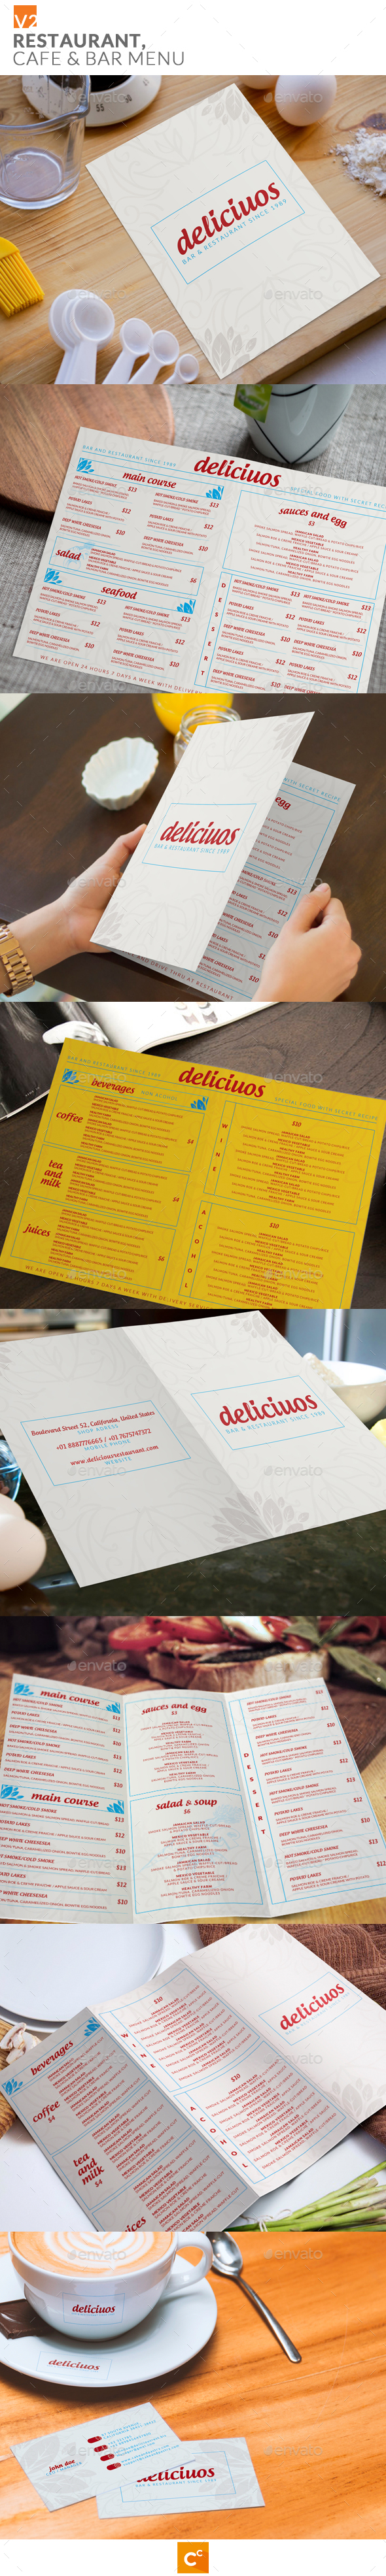 Restaurant Cafe & Bar Menu v2 - Food Menus Print Templates